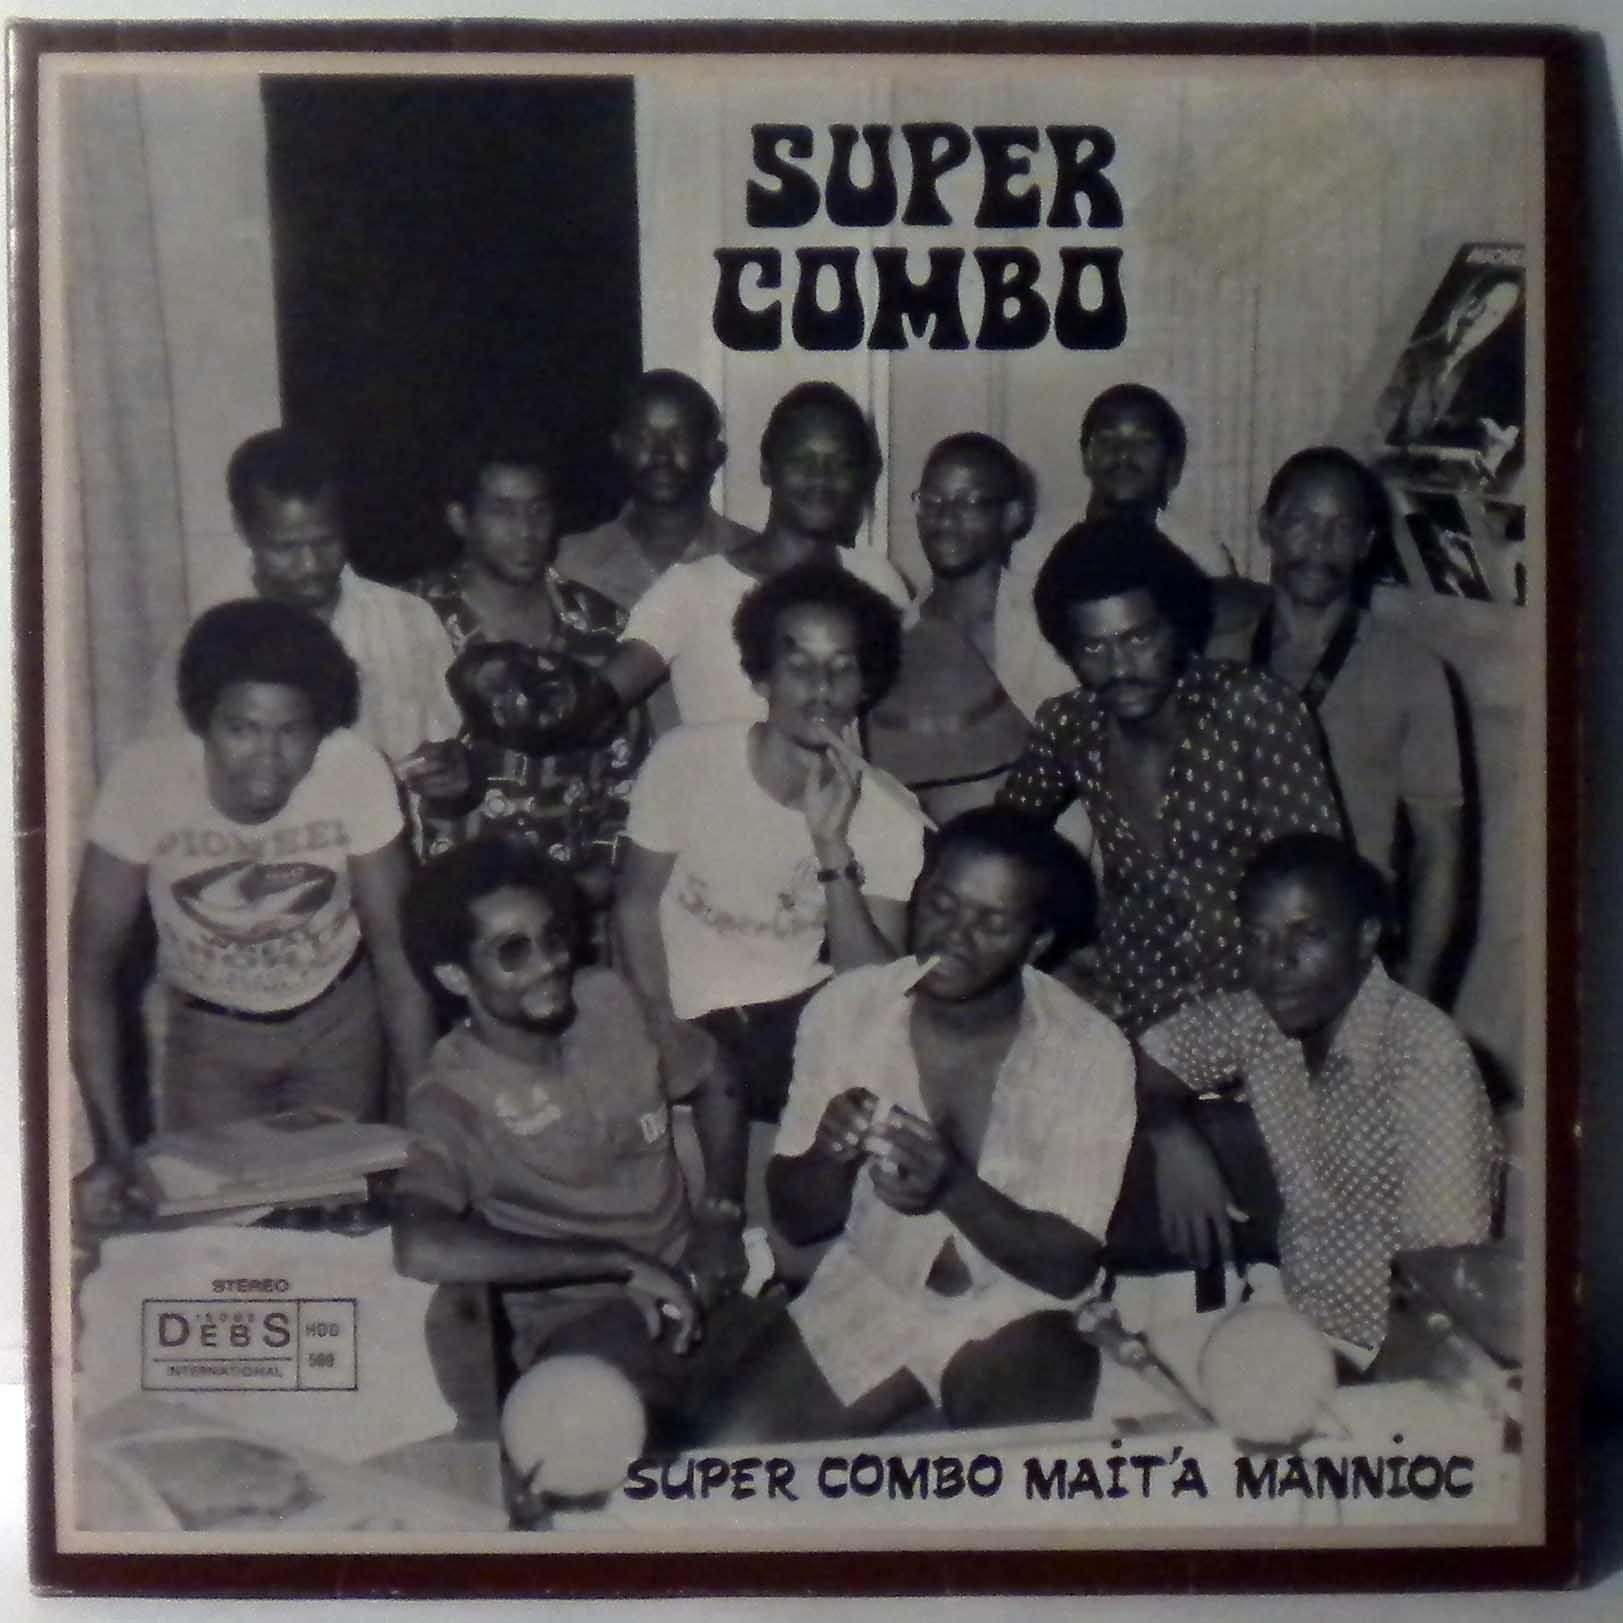 SUPER COMBO - Super Combo maita mannioc - LP